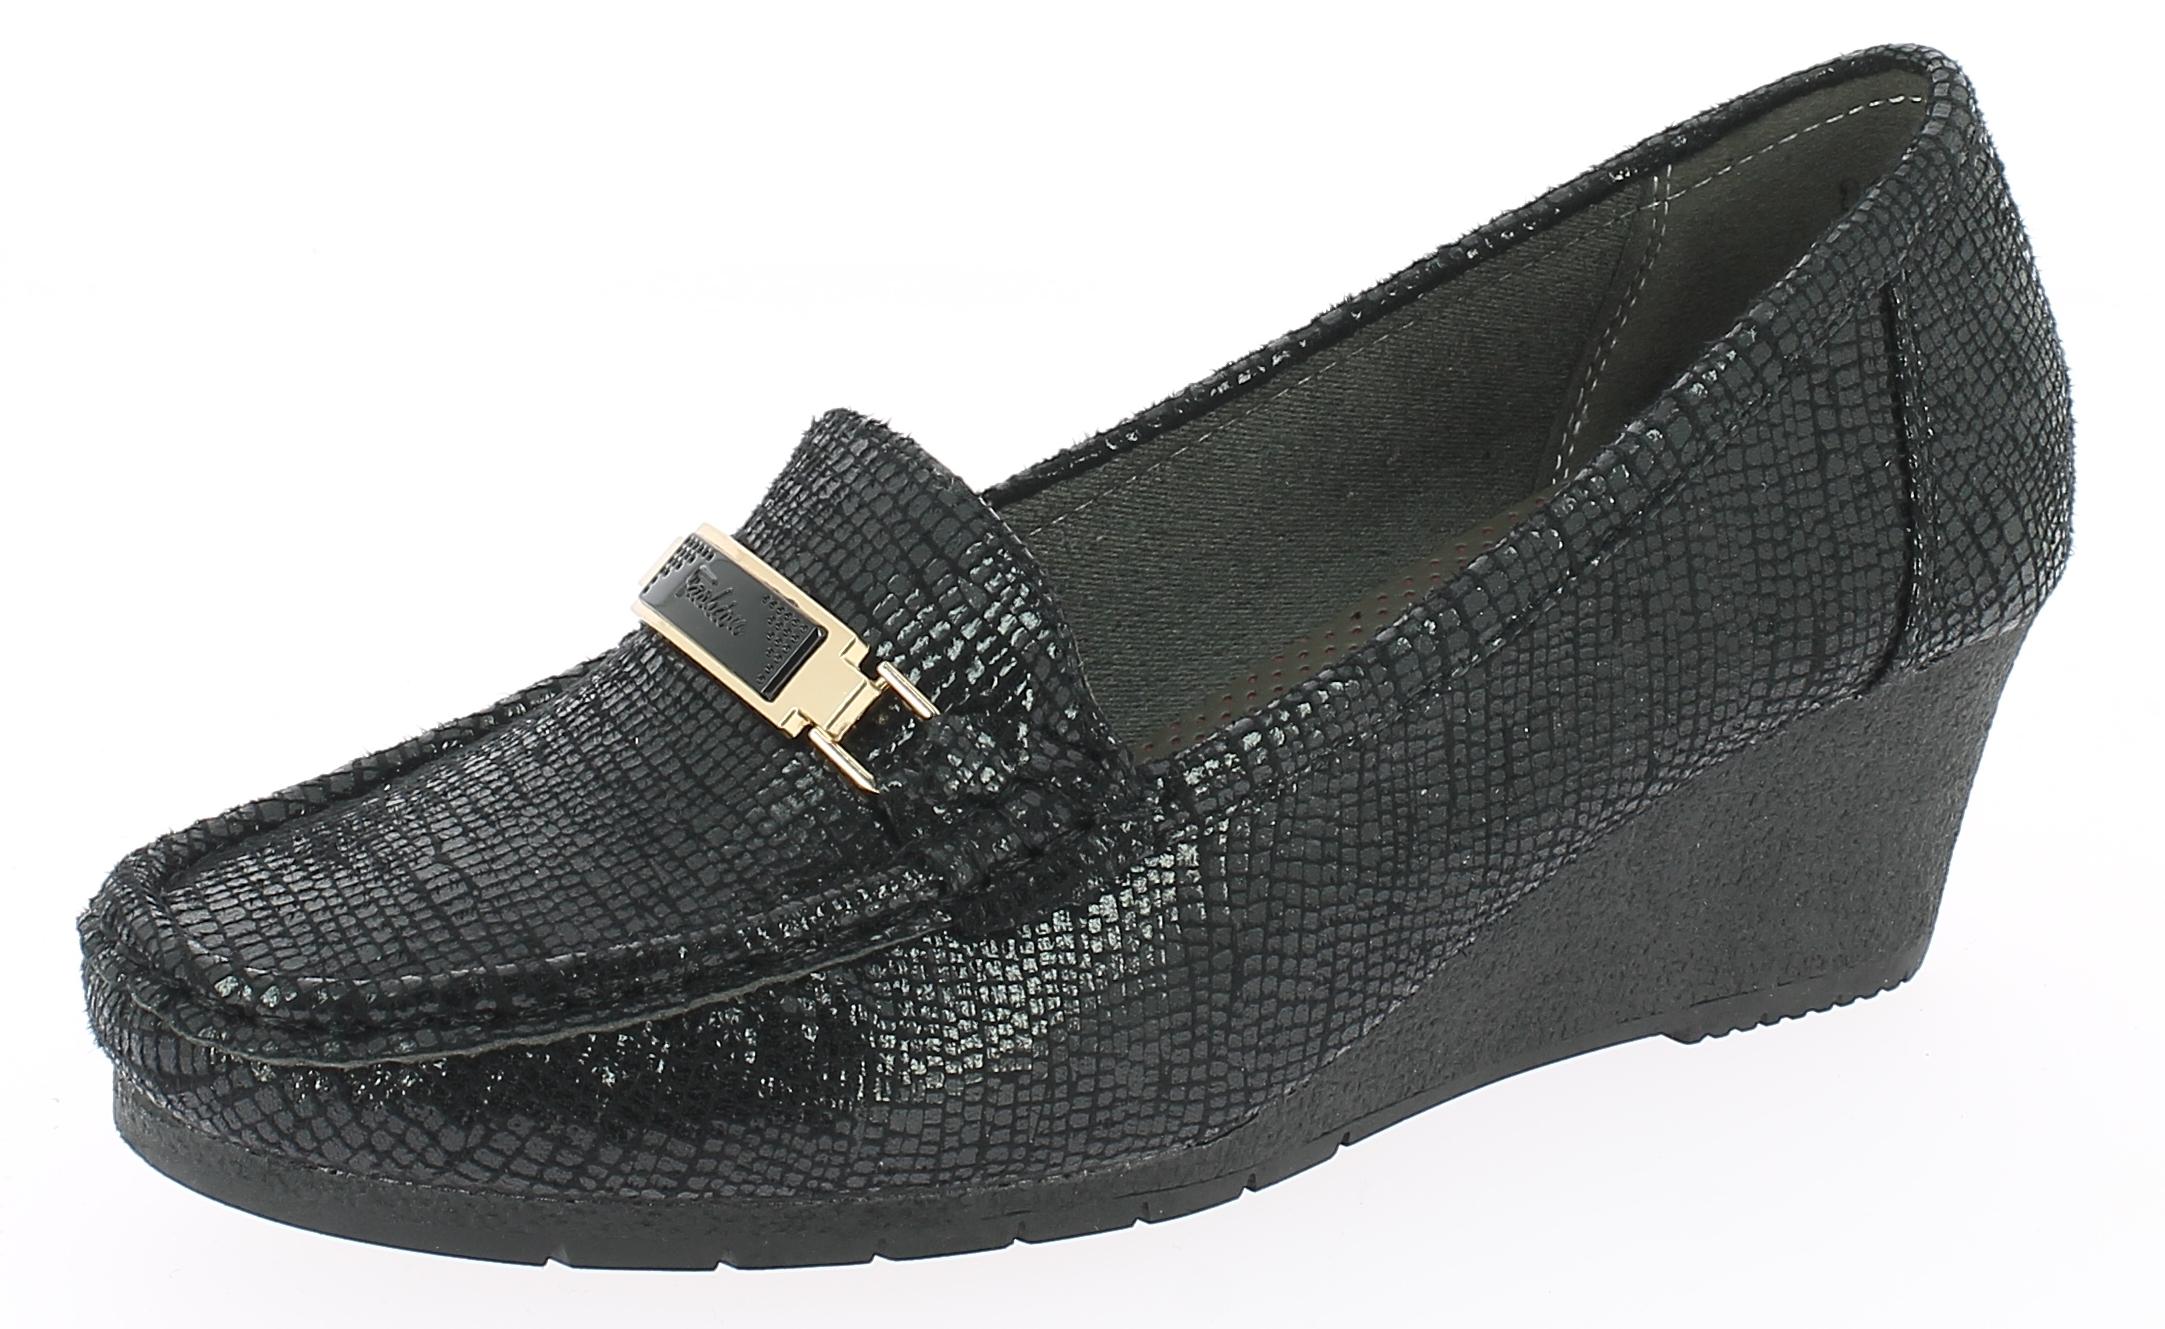 IQSHOES Γυναικείο Comfort 8107 Μαύρο - IqShoes - 8107 BLACK-black-38/1/15/11 παπούτσια  new in